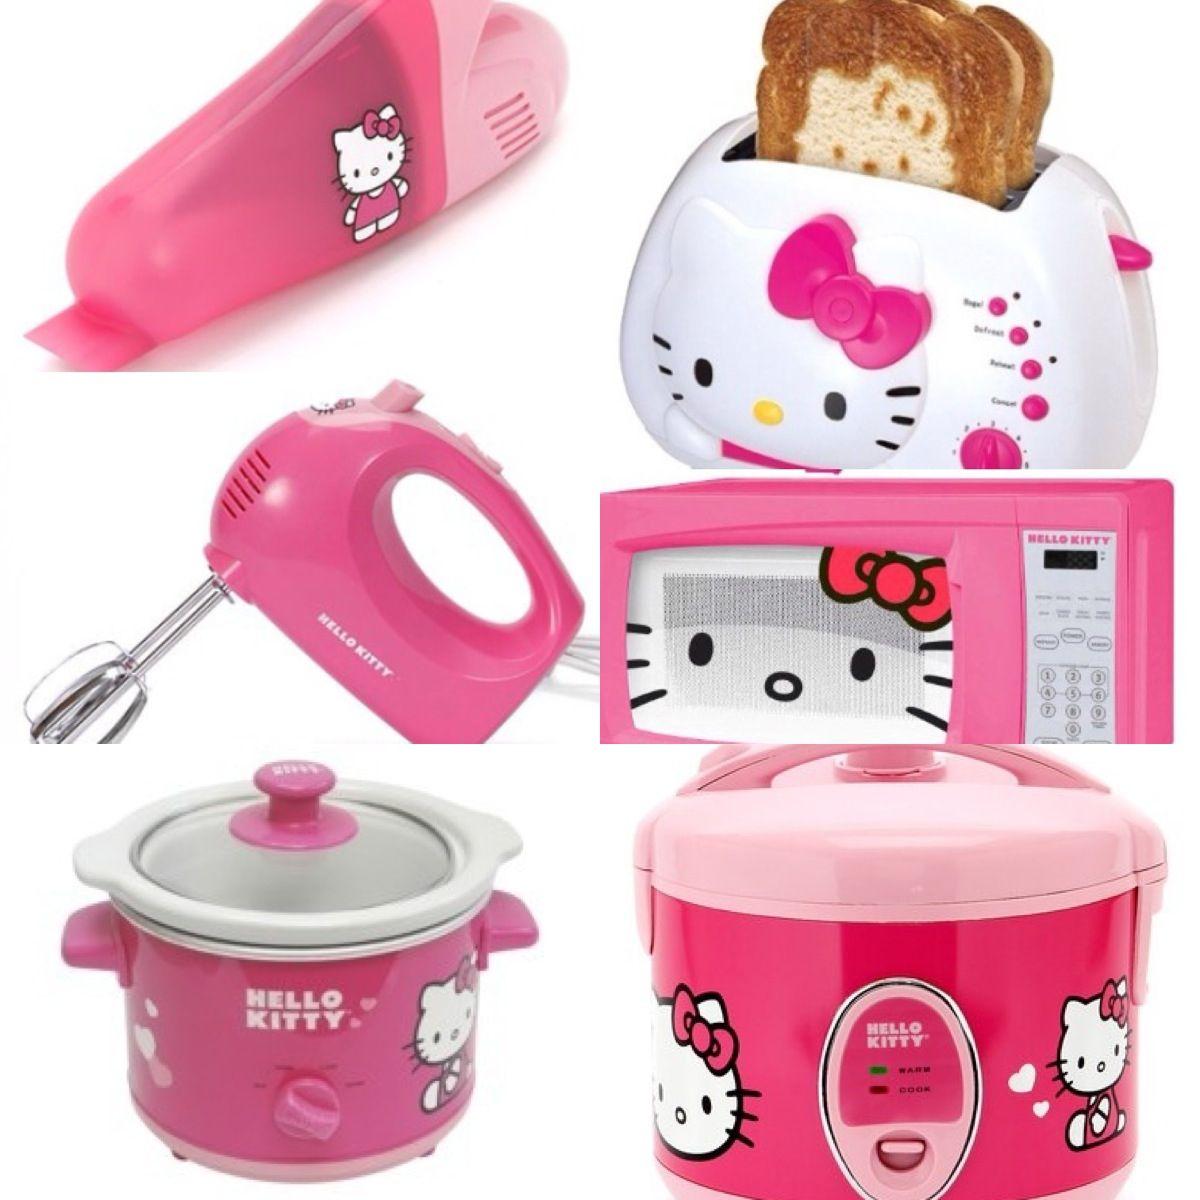 Hello Kitty Kitchen Appliances From Target